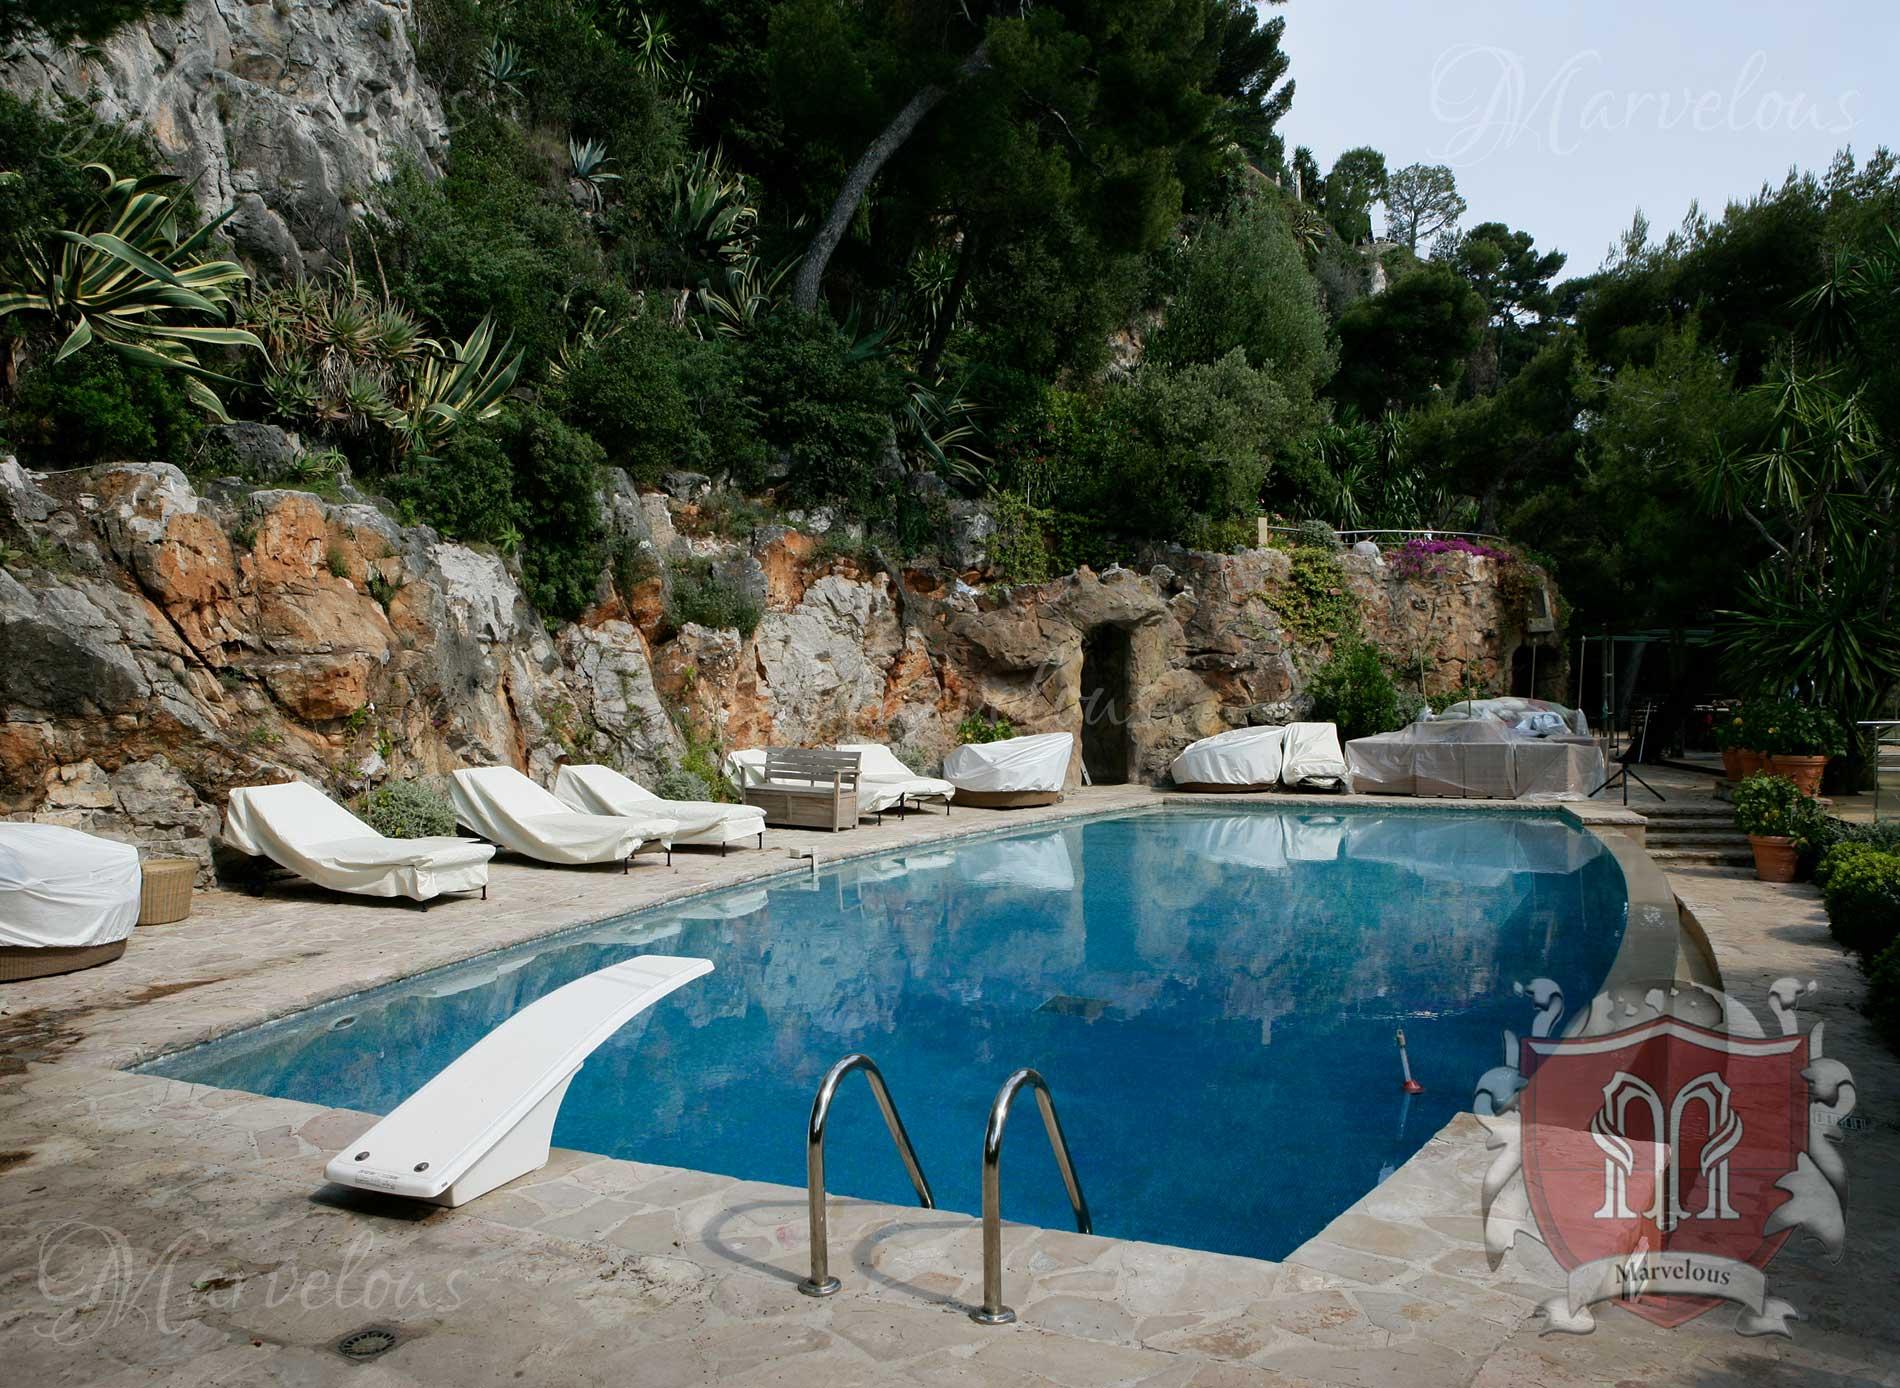 Marble Pool Mosaic: Bella Pietra